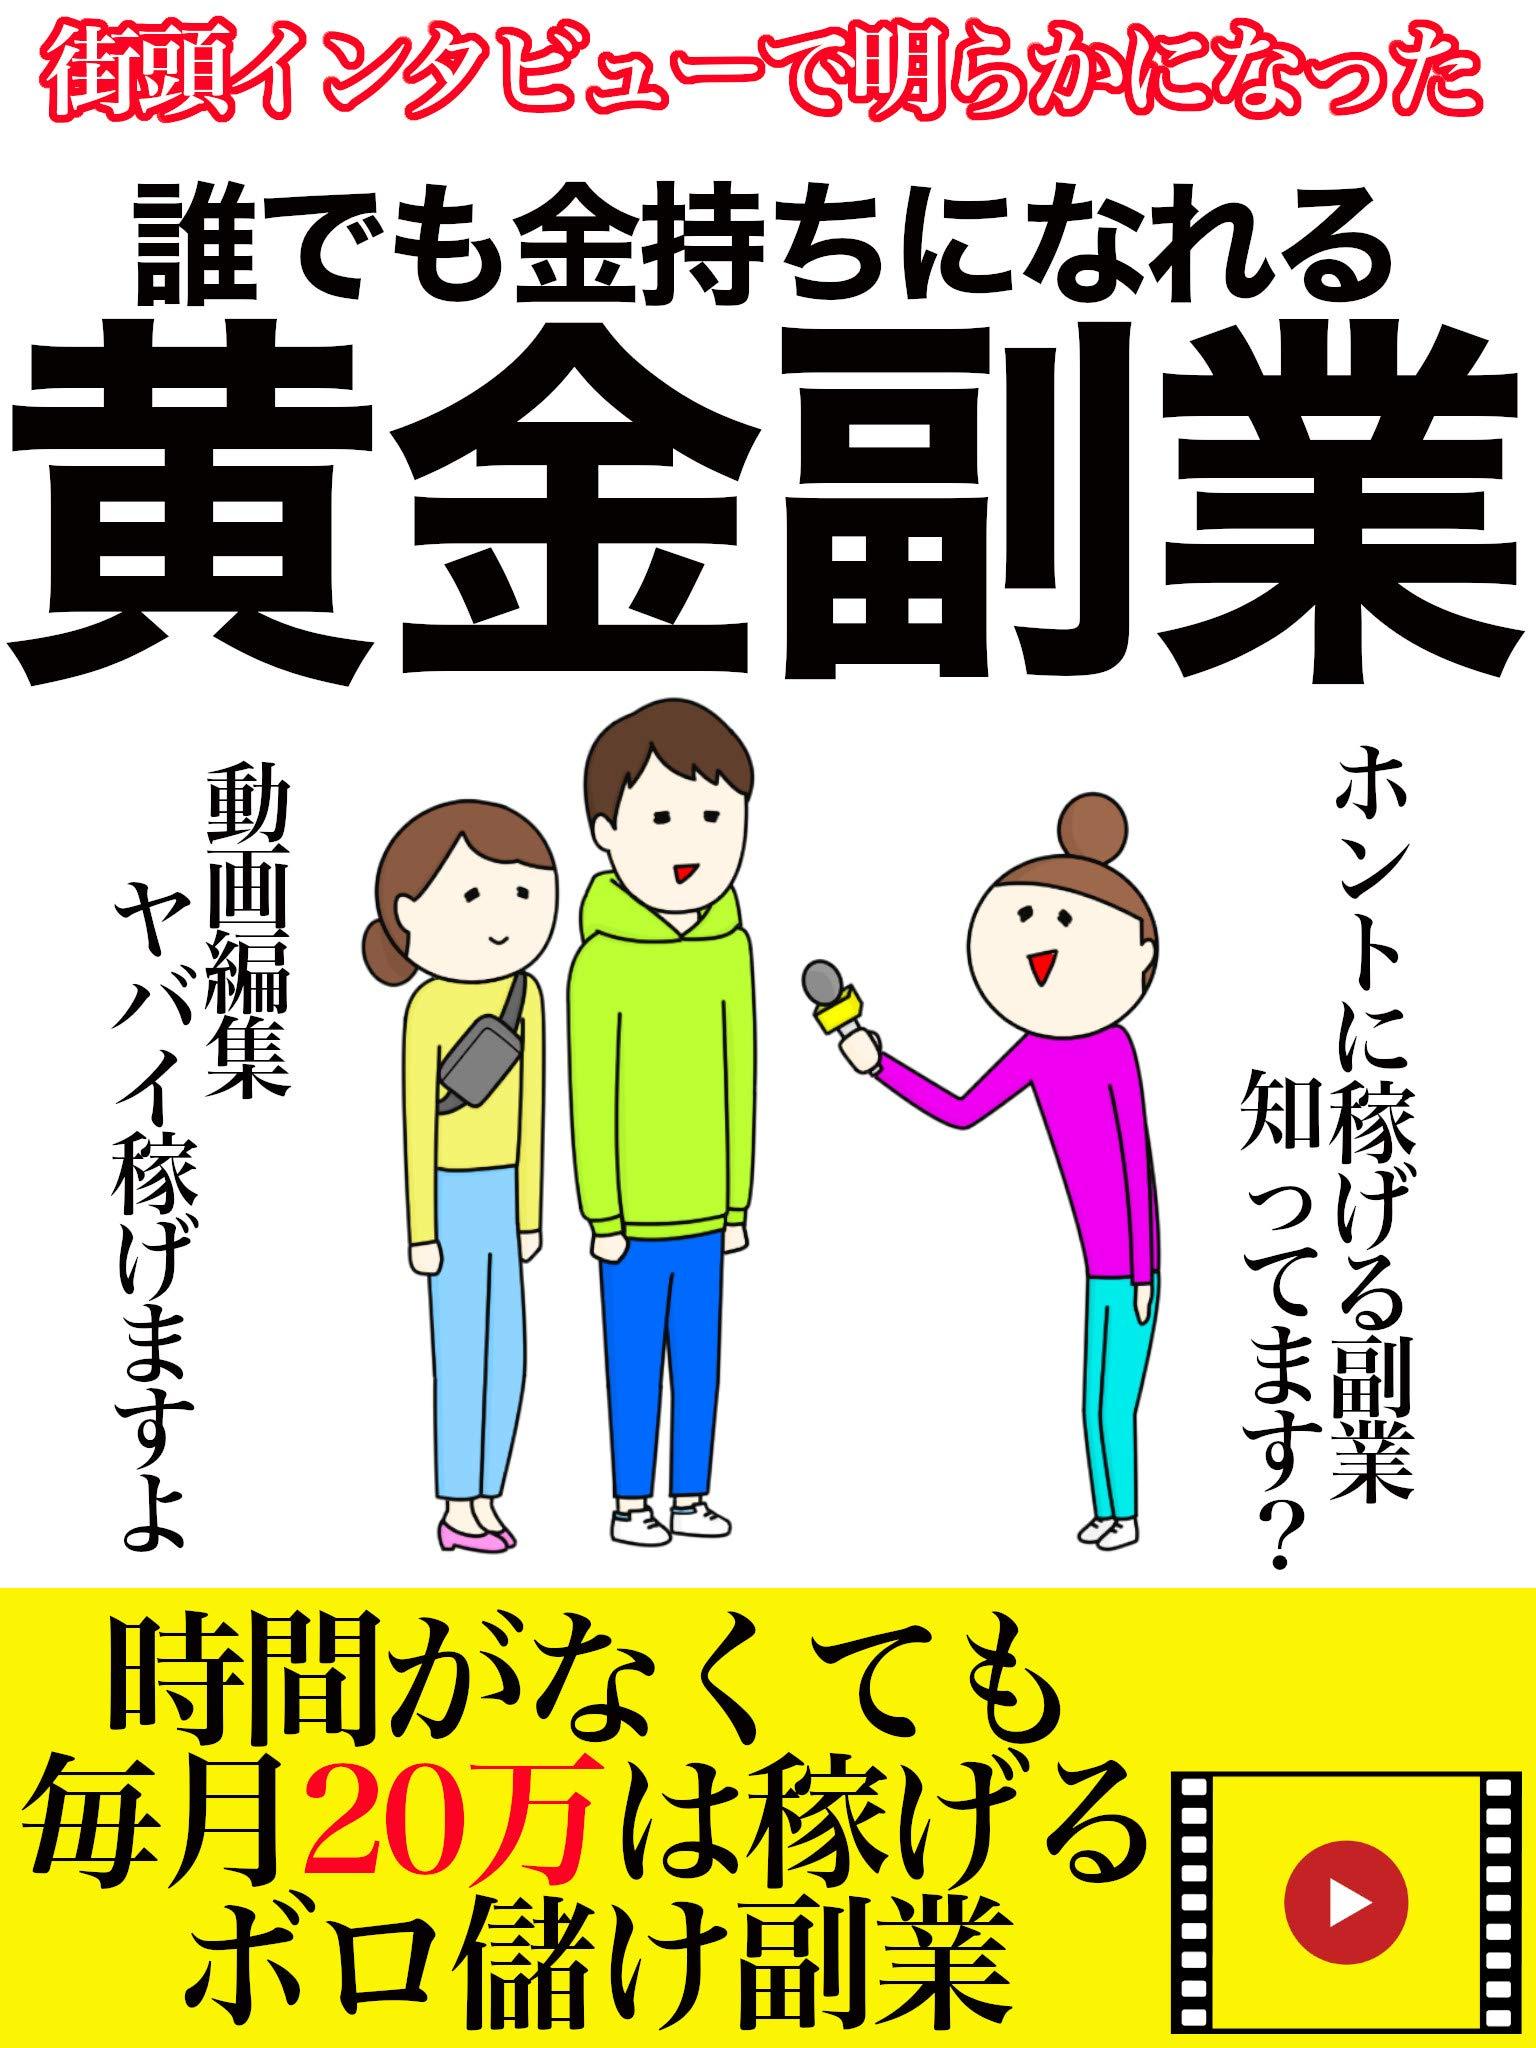 gaitouinntabyu-deakirakaninattadardemokasegeruougonnhukugyou: dougahennsyuu jitannhukugyou sarari-mannmuke (Japanese Edition)